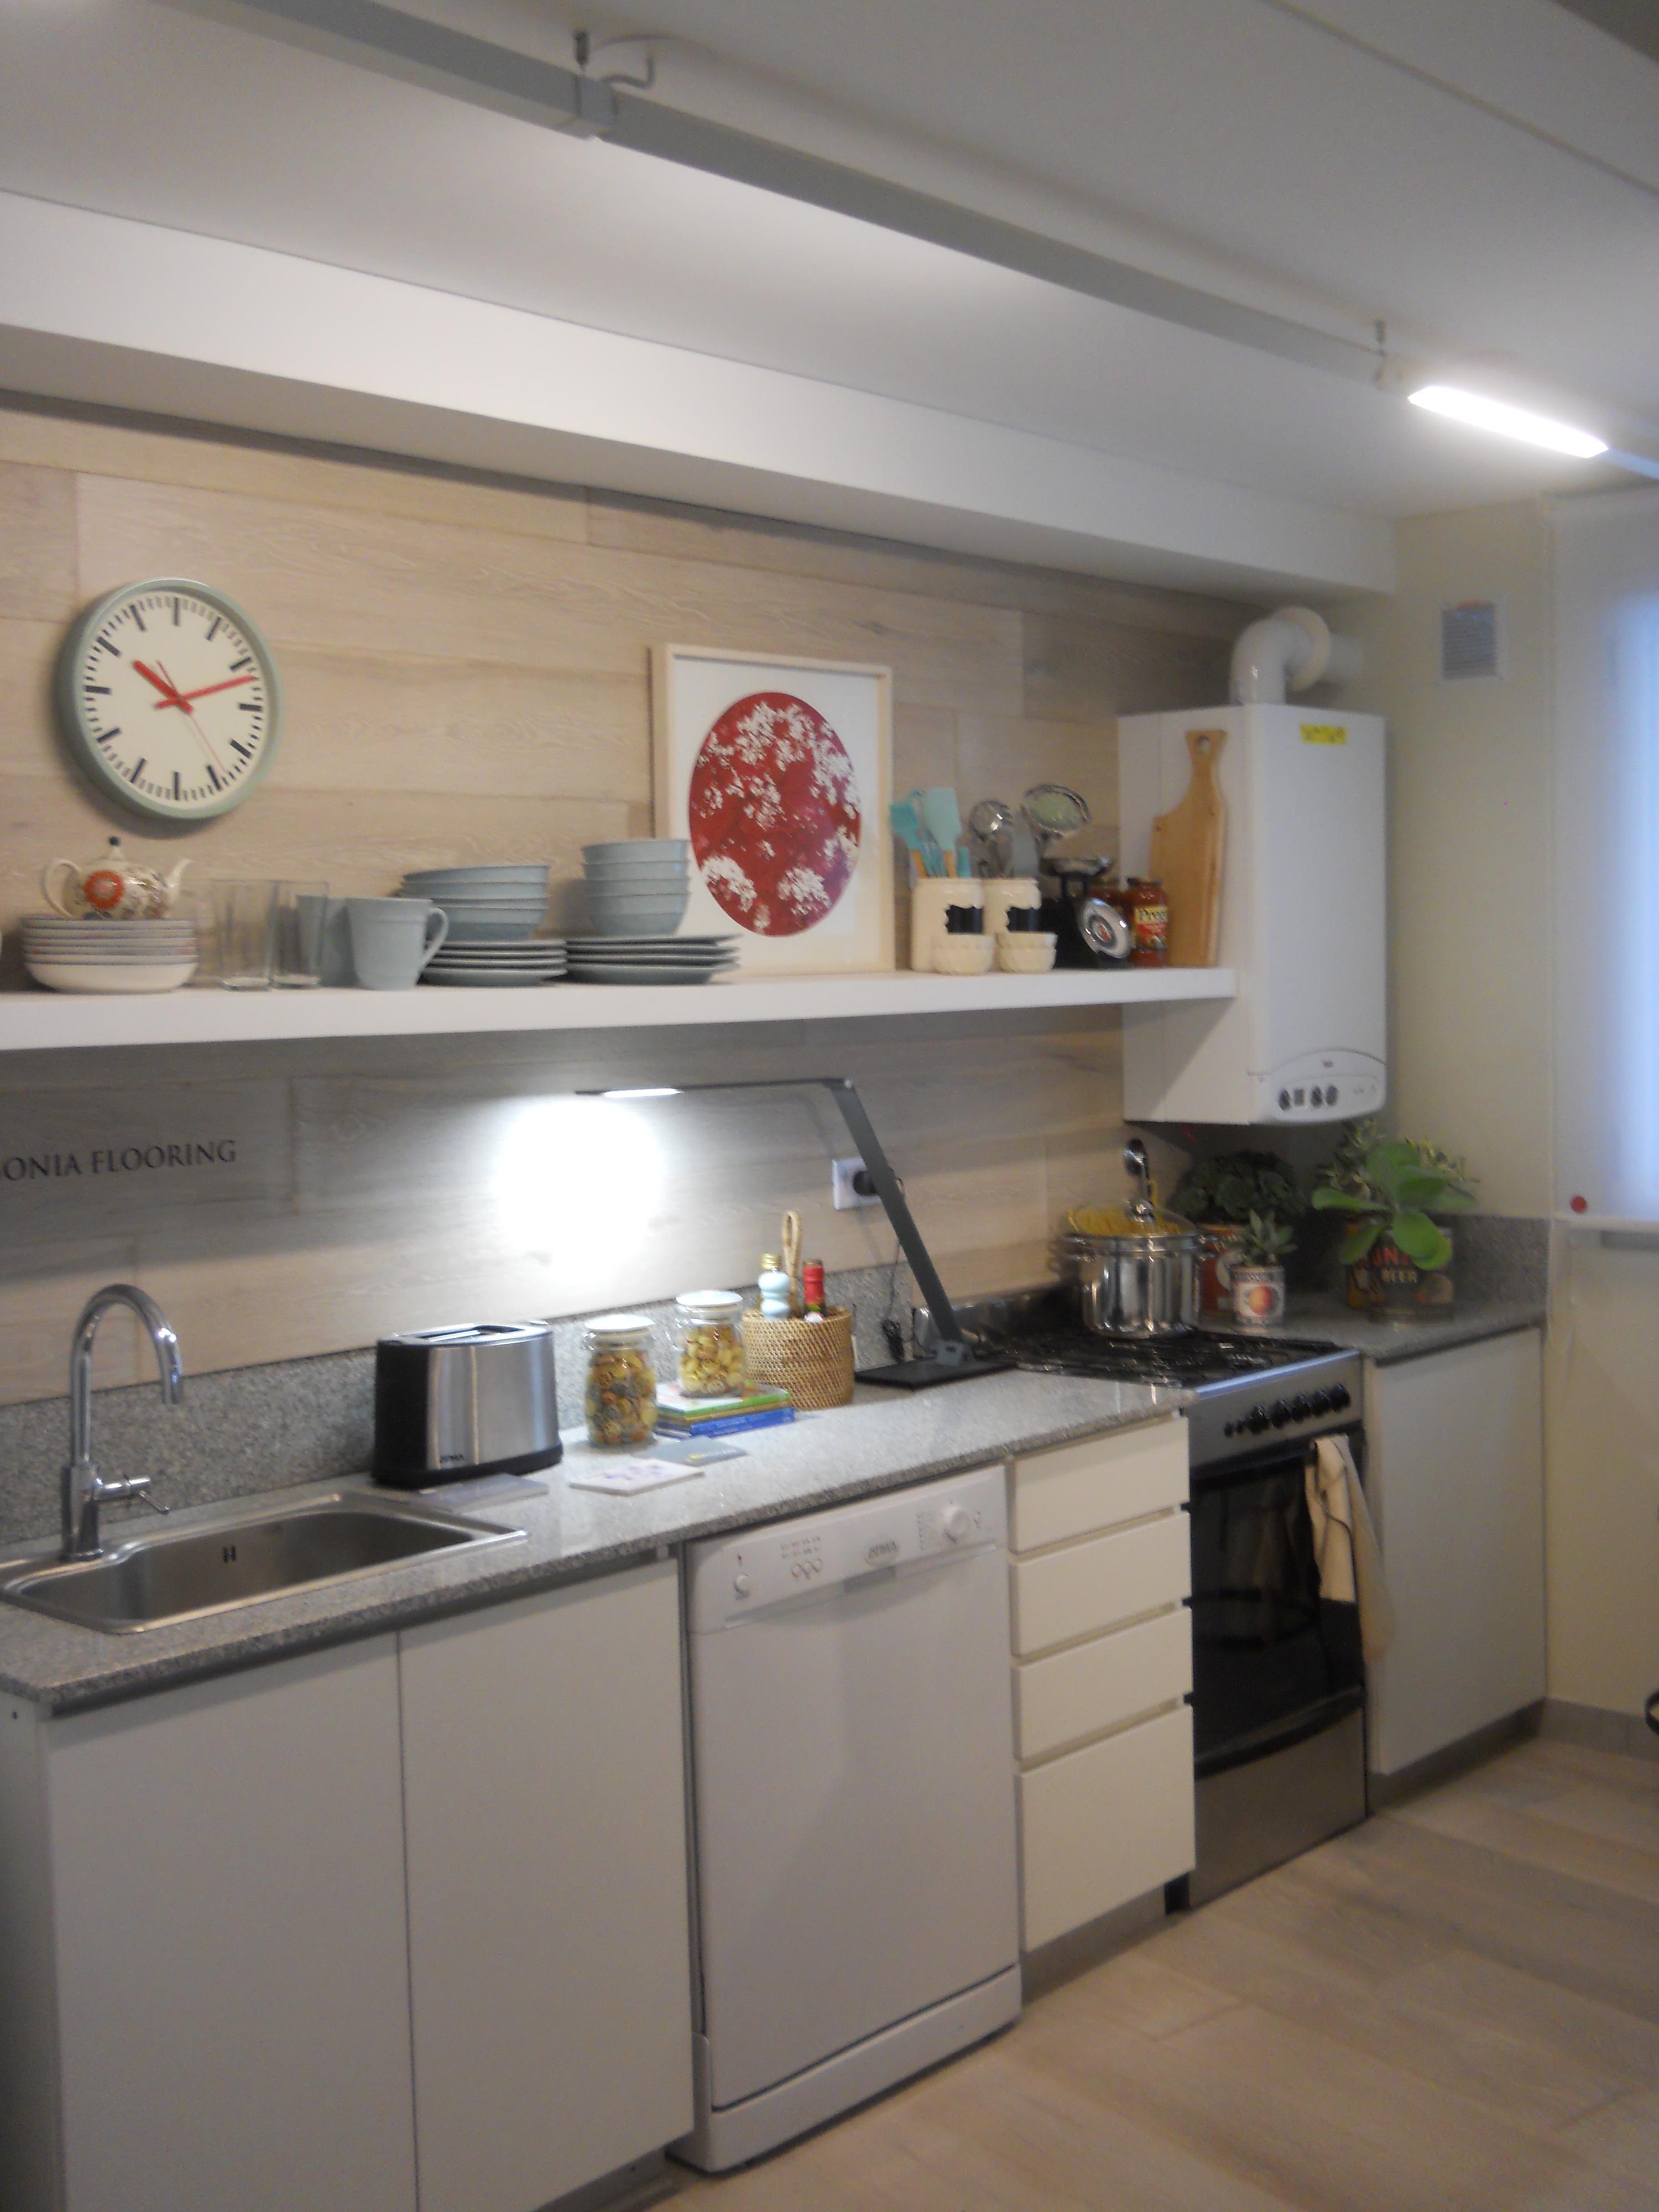 Iluminacion para cocina cocina moderna muy elegante con muebles e isla de color negro cocina - Iluminacion para cocinas modernas ...